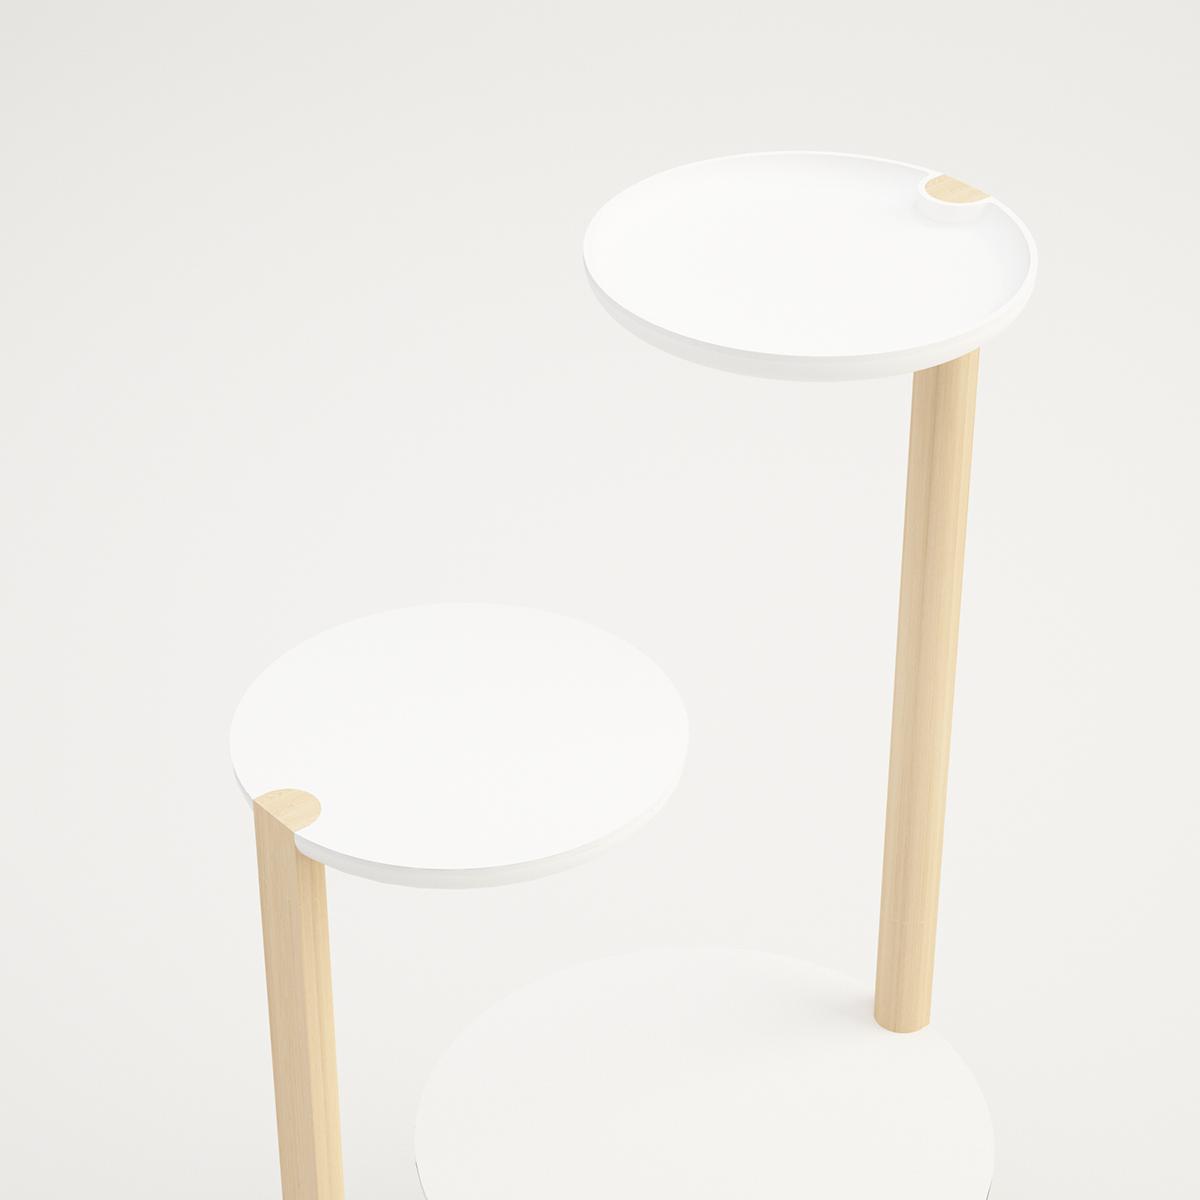 furniture,accessories,lighting